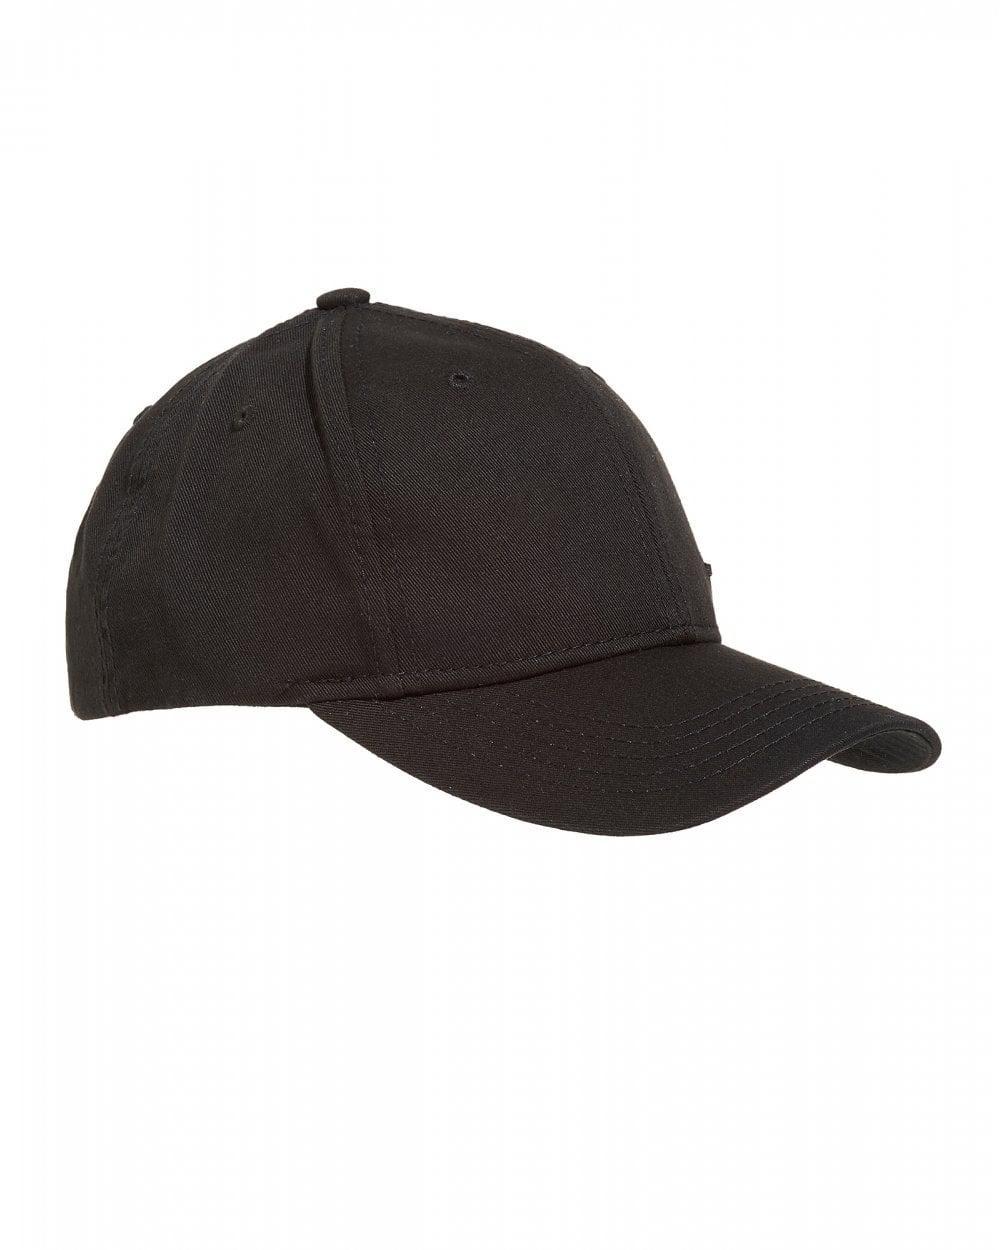 231f7cbbeb3 Lyst - True Religion Metal Logo Black Baseball Cap in Black for Men